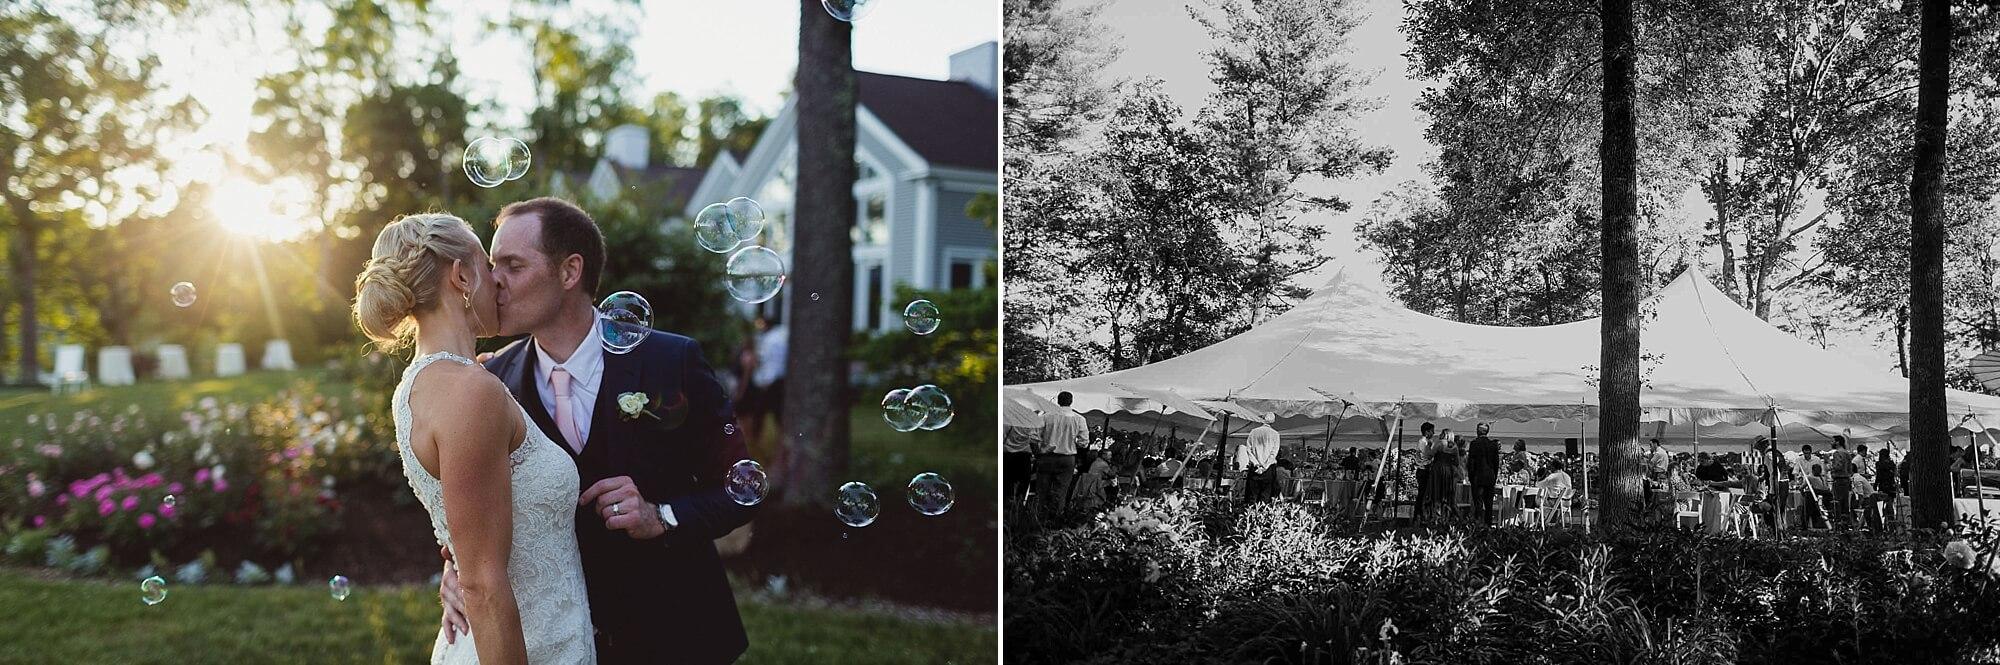 Backyard Wedding - MA_0082.jpg